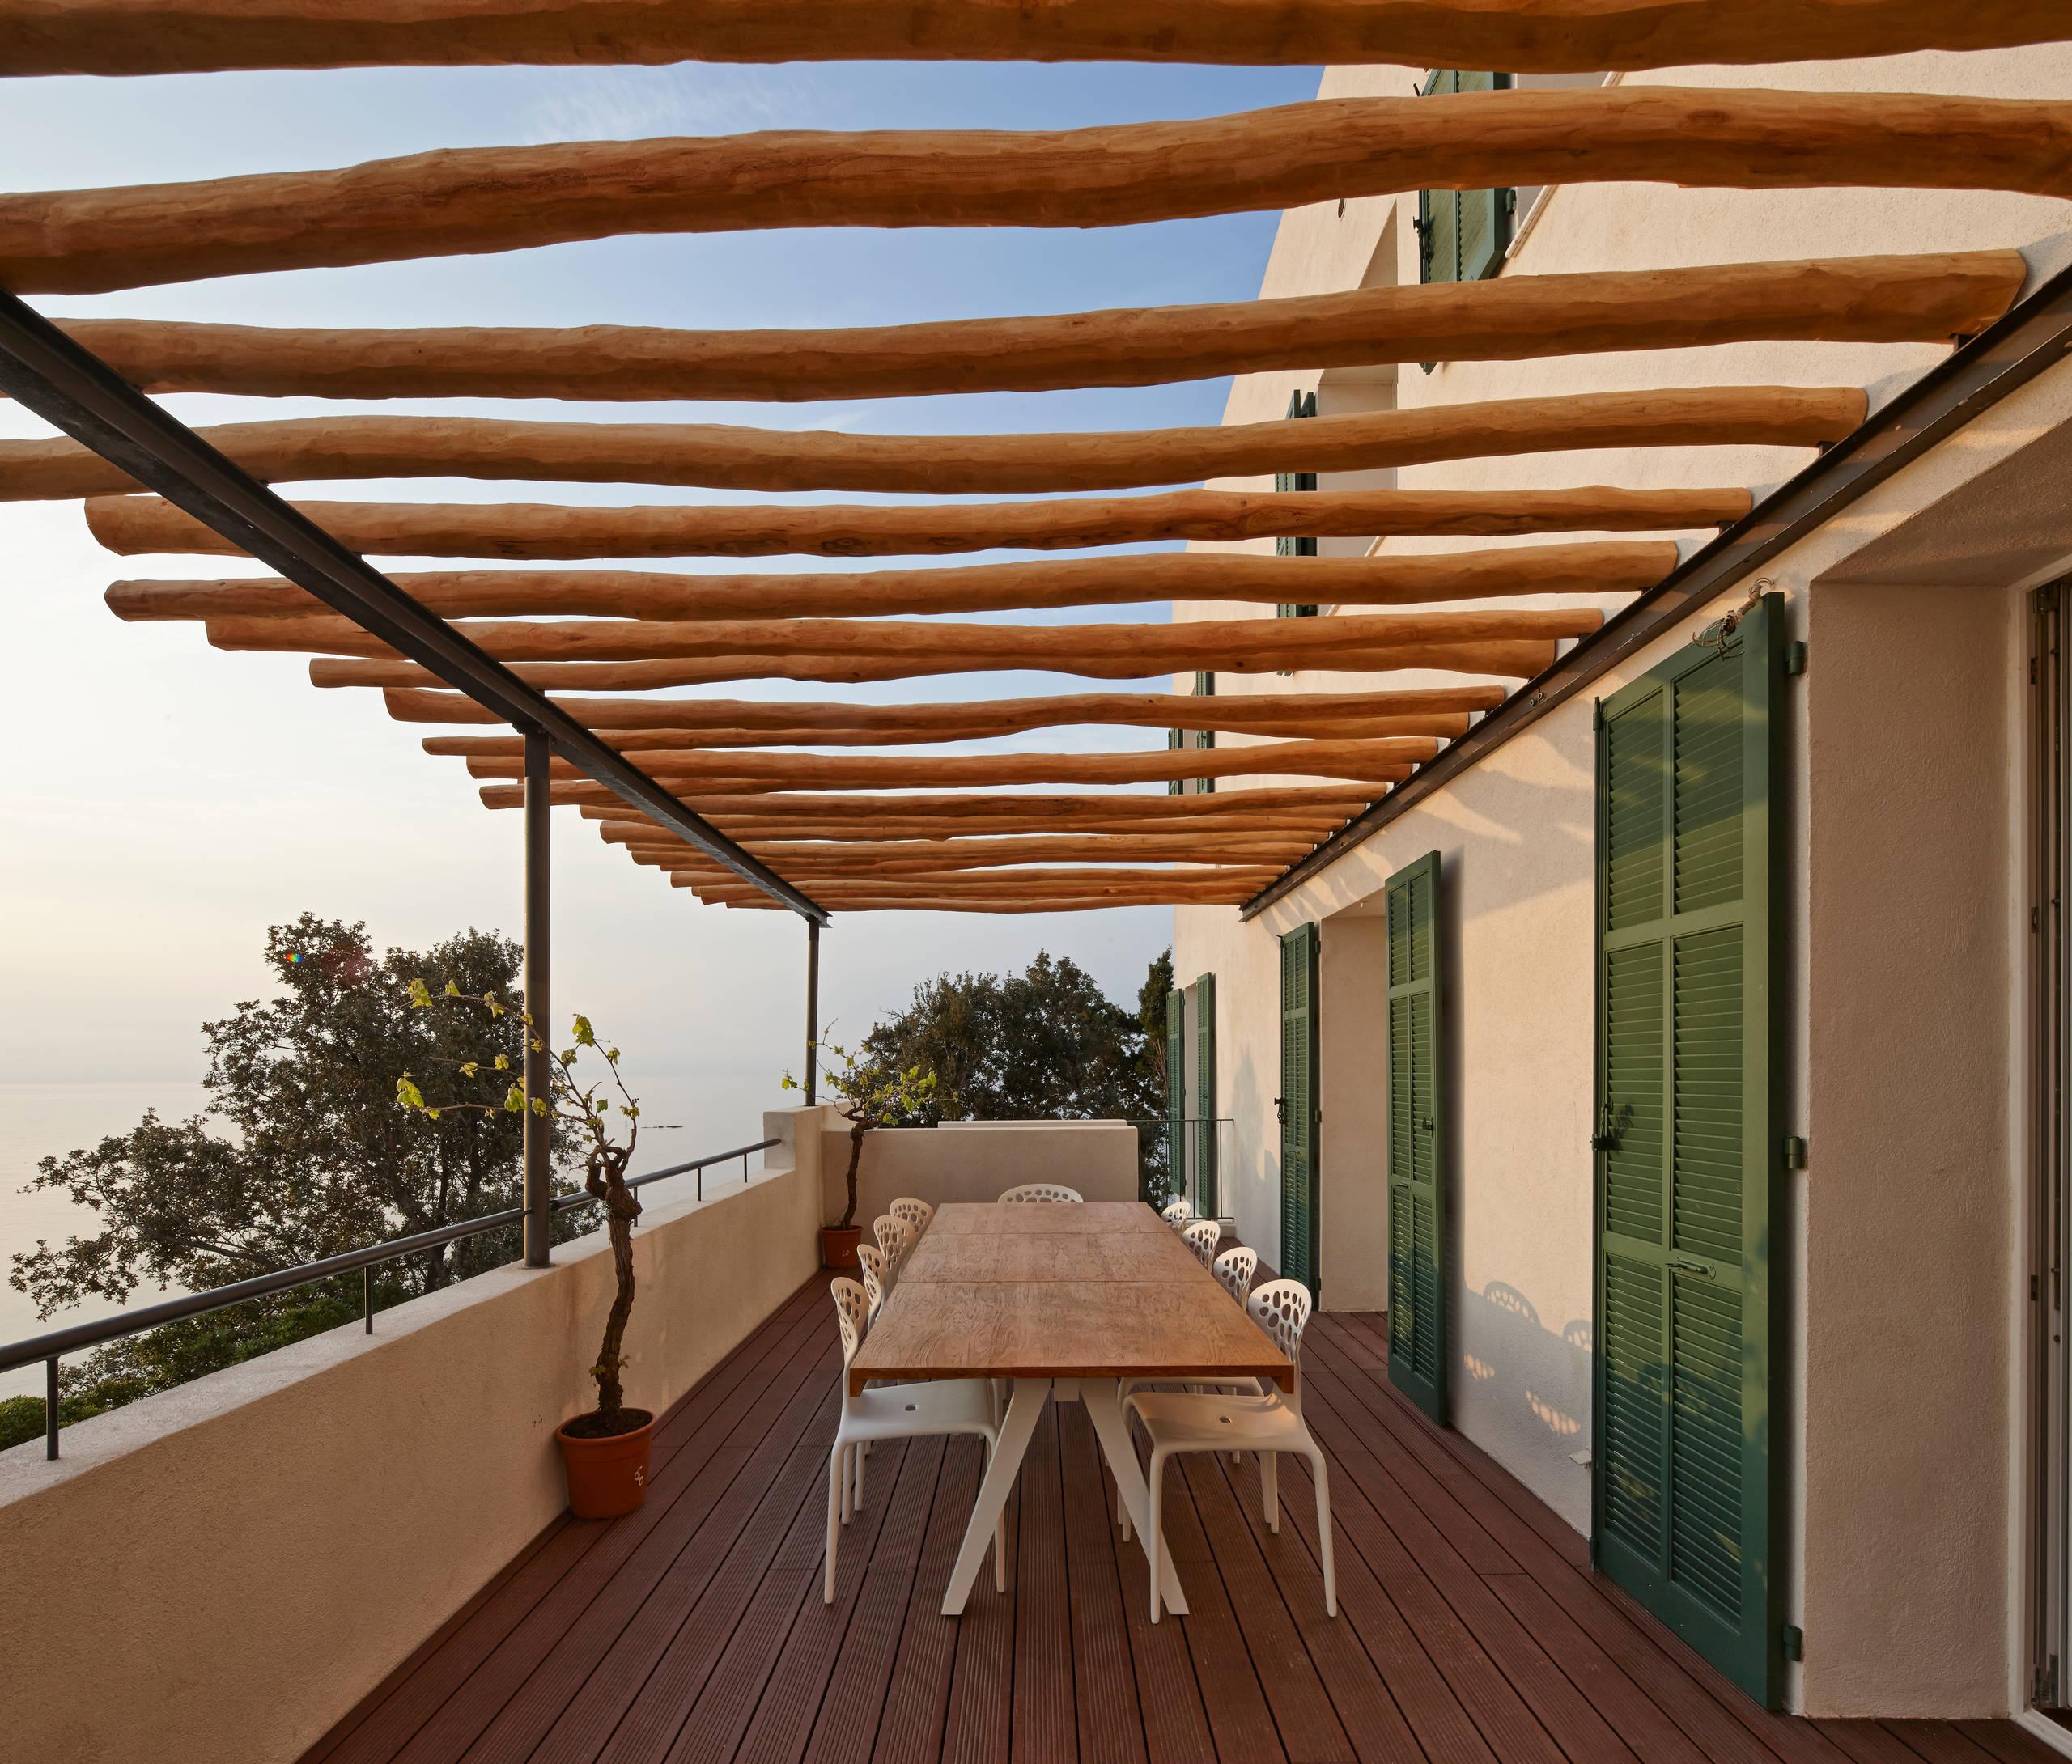 Pergola Bois Et Fer 75 beautiful mediterranean balcony with a pergola pictures